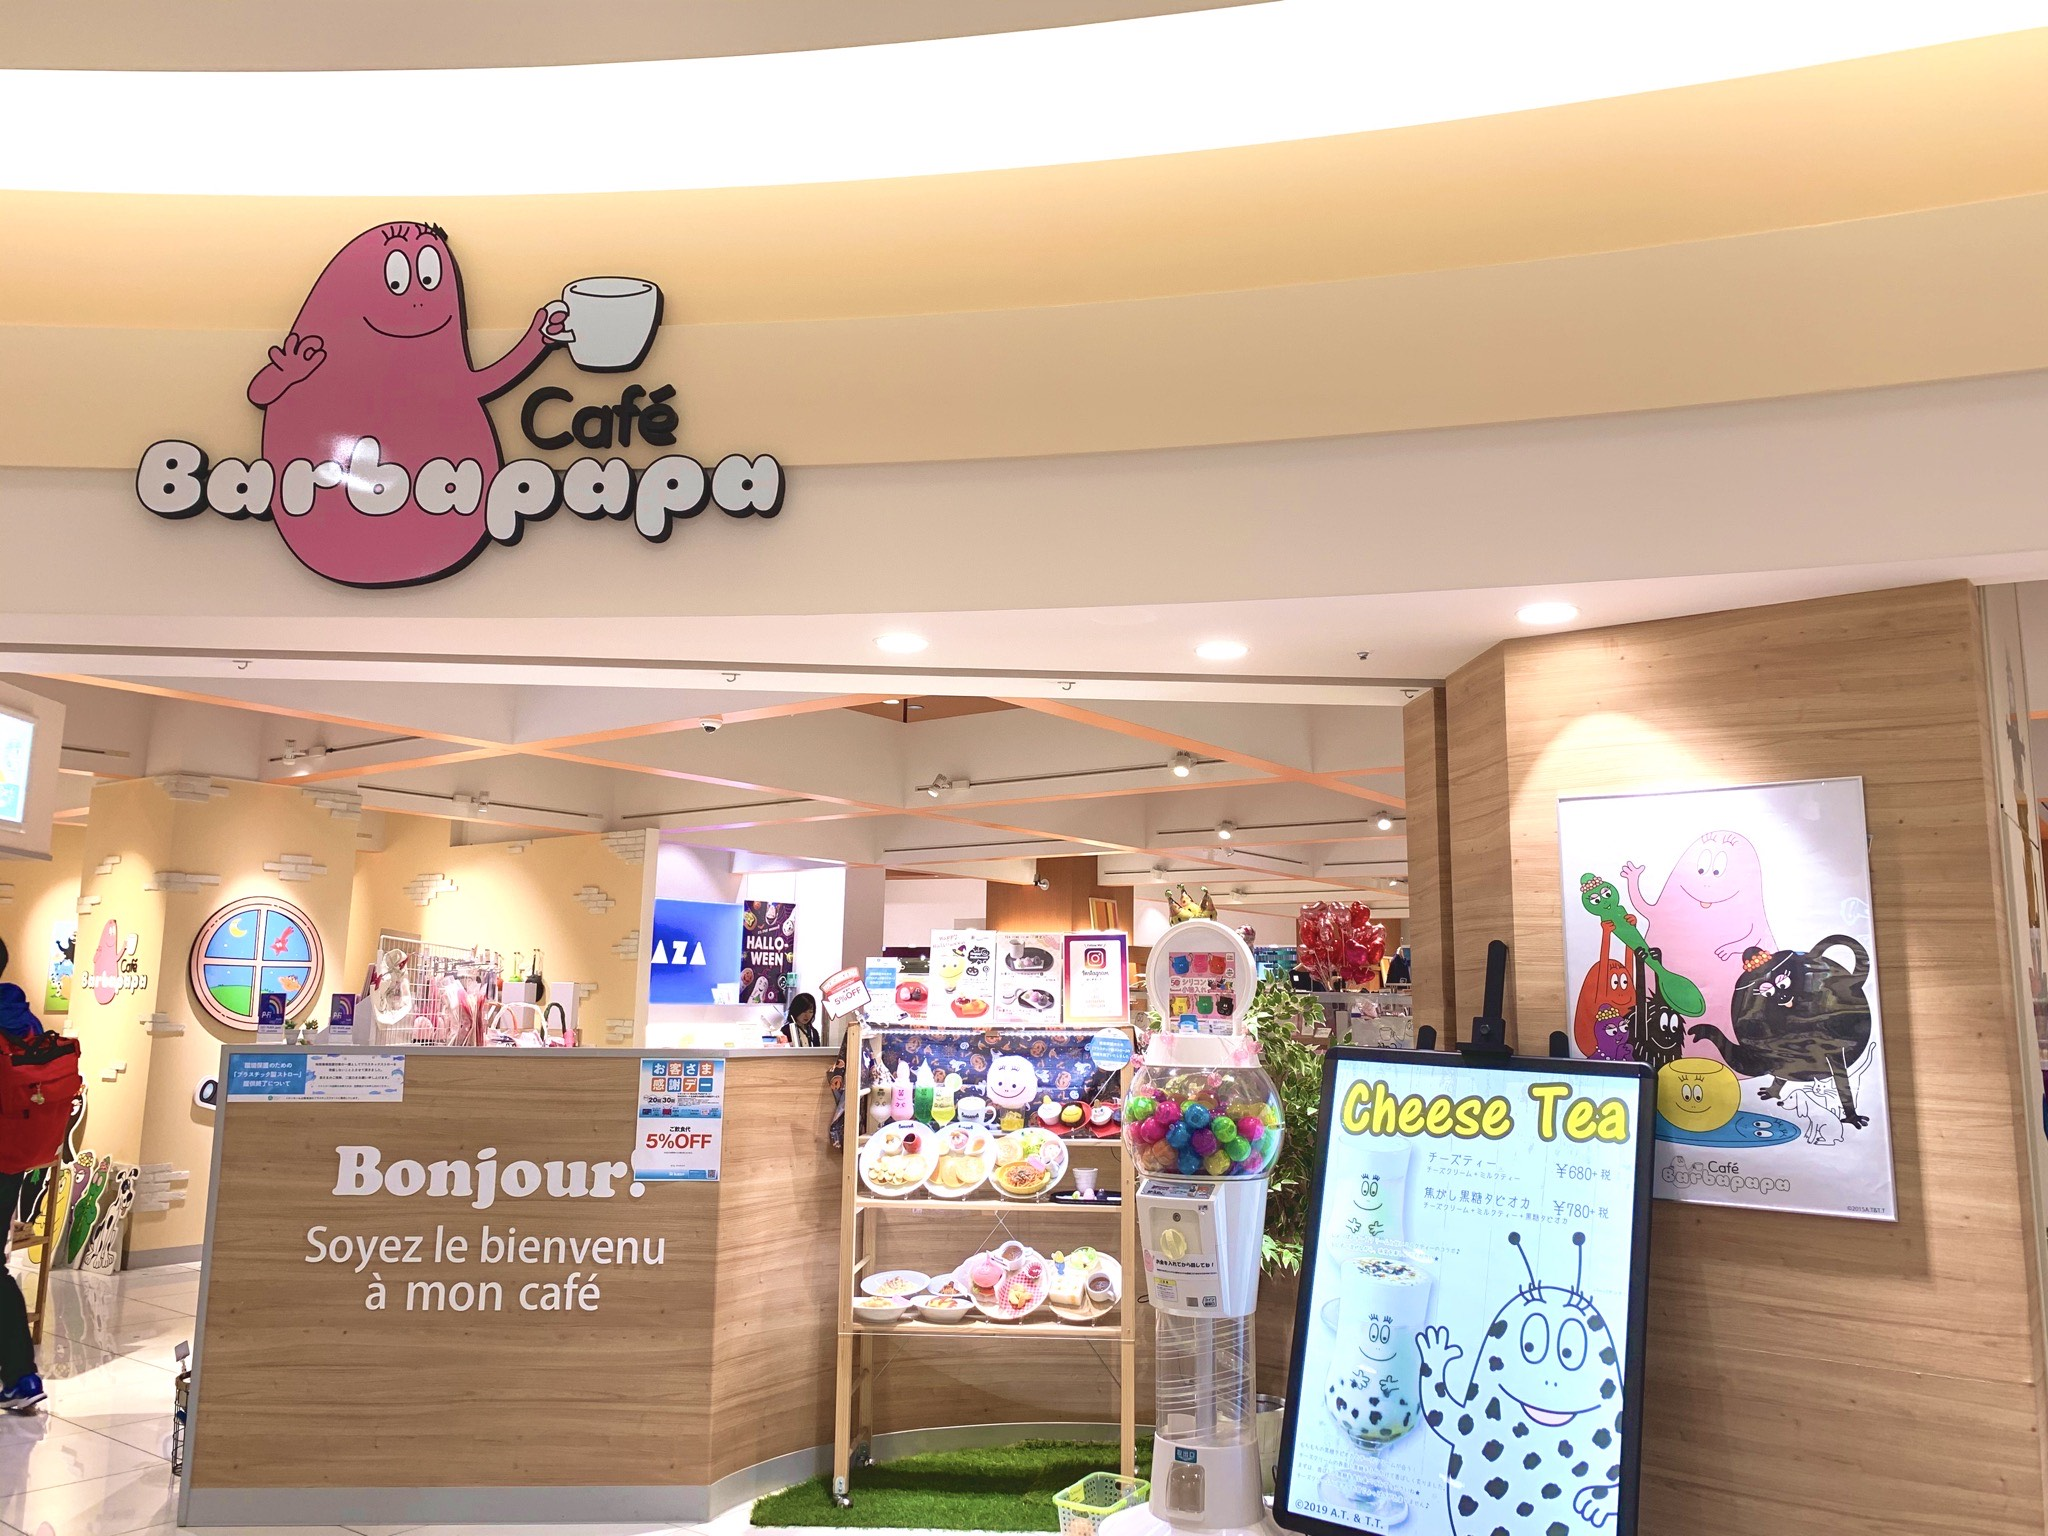 Cafe Barbapapa